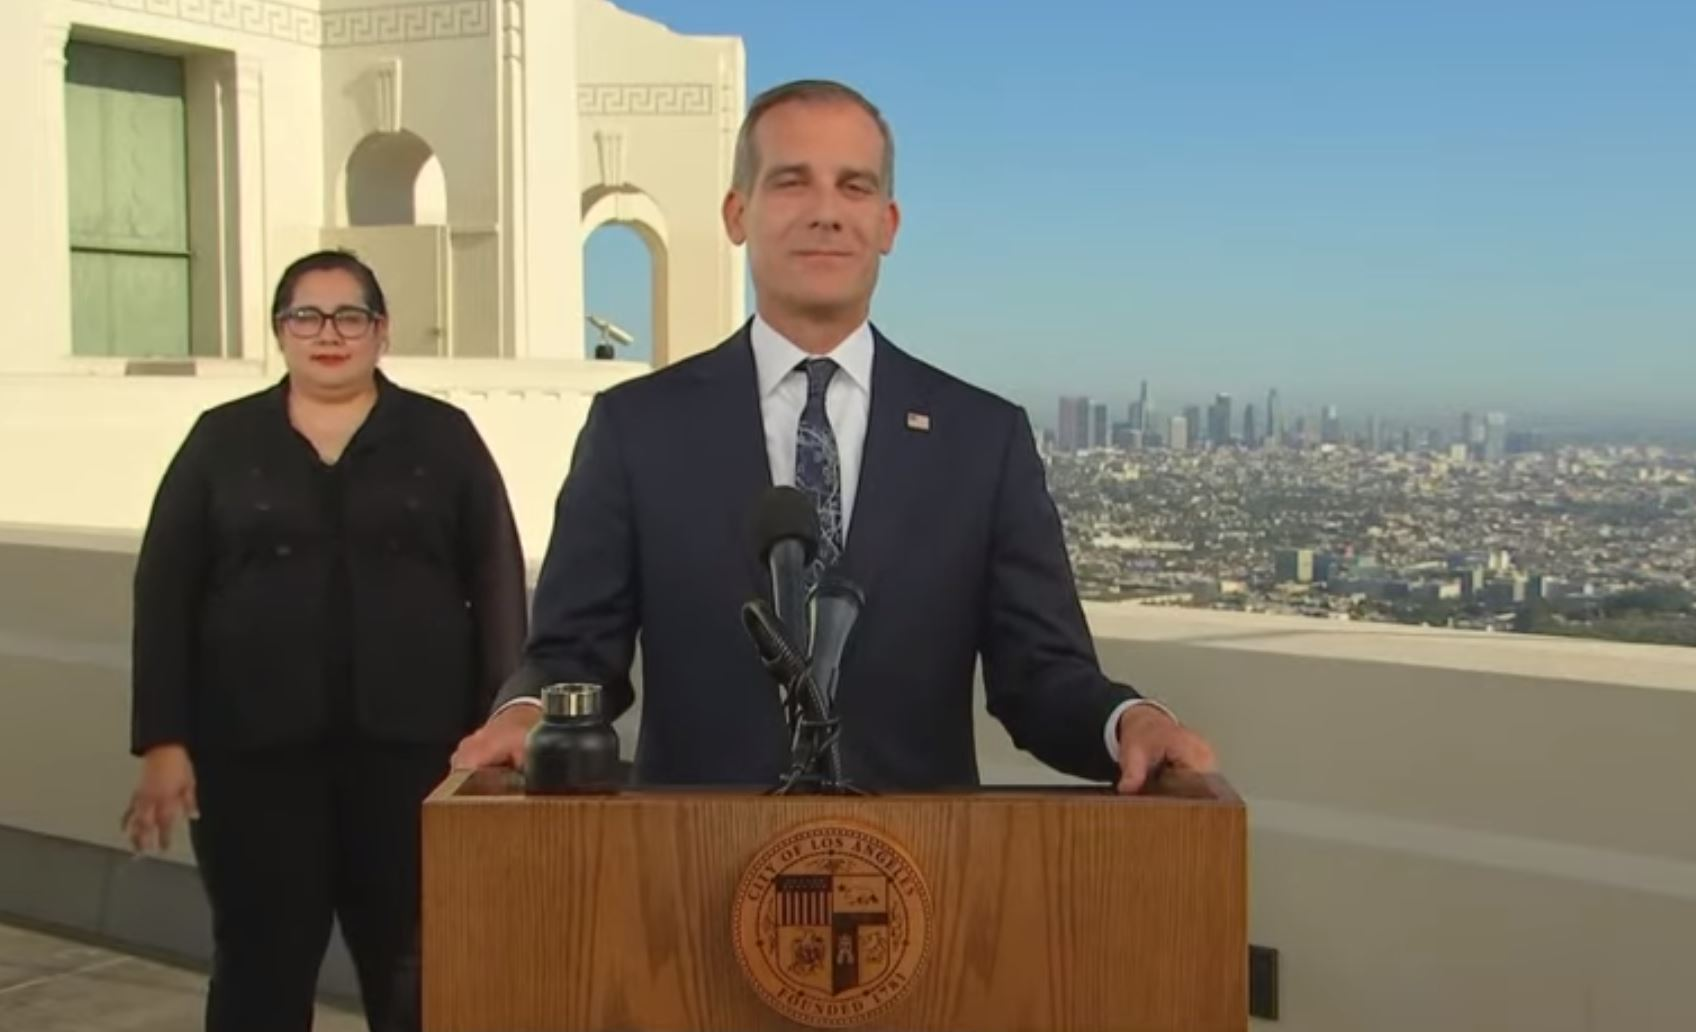 Mayor Garcetti Proposes $1 Billion in Spending to Combat LA's Homeless Crisis